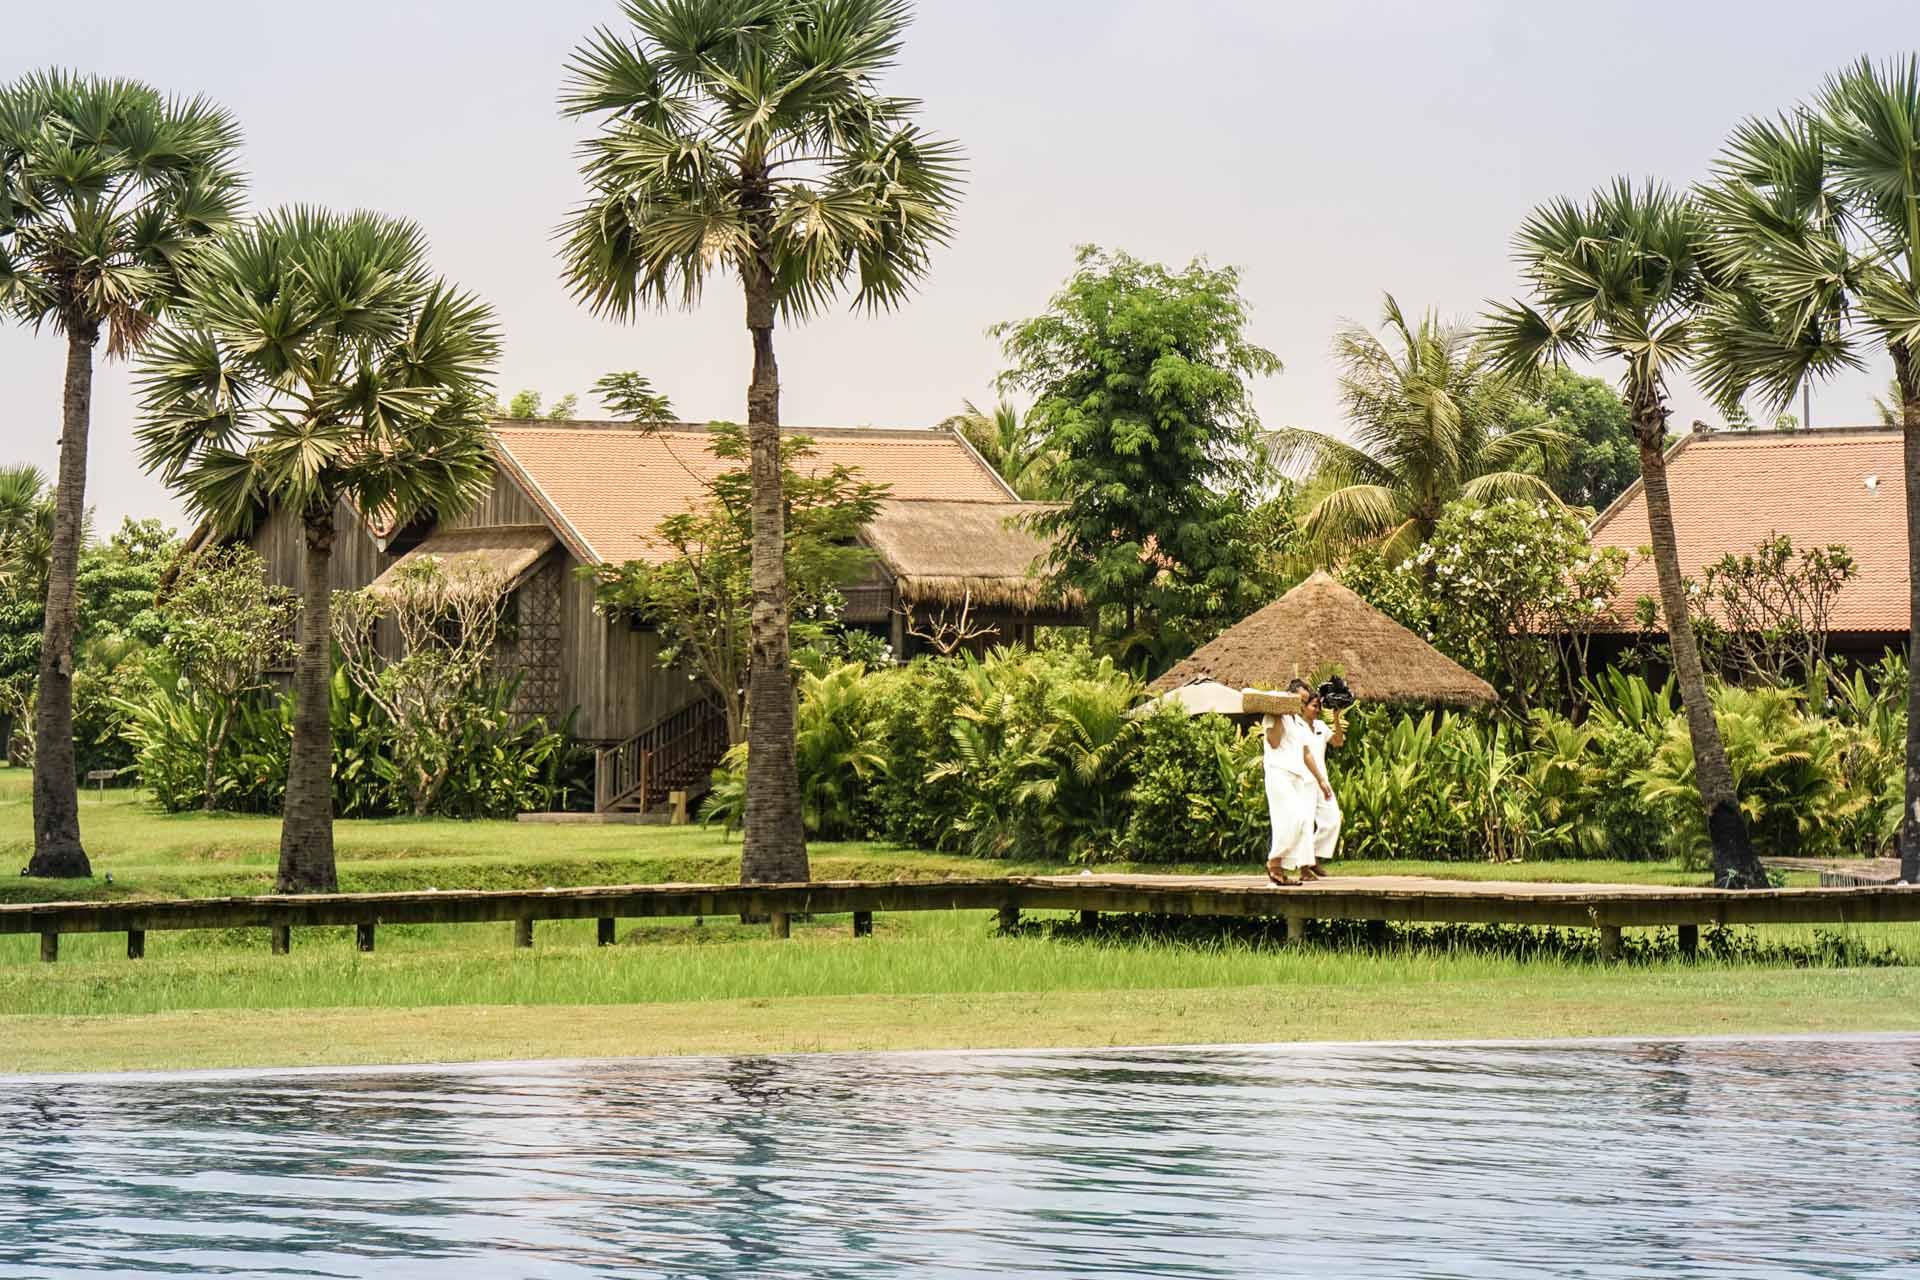 Hotel Phum Baitang Siem Reap View